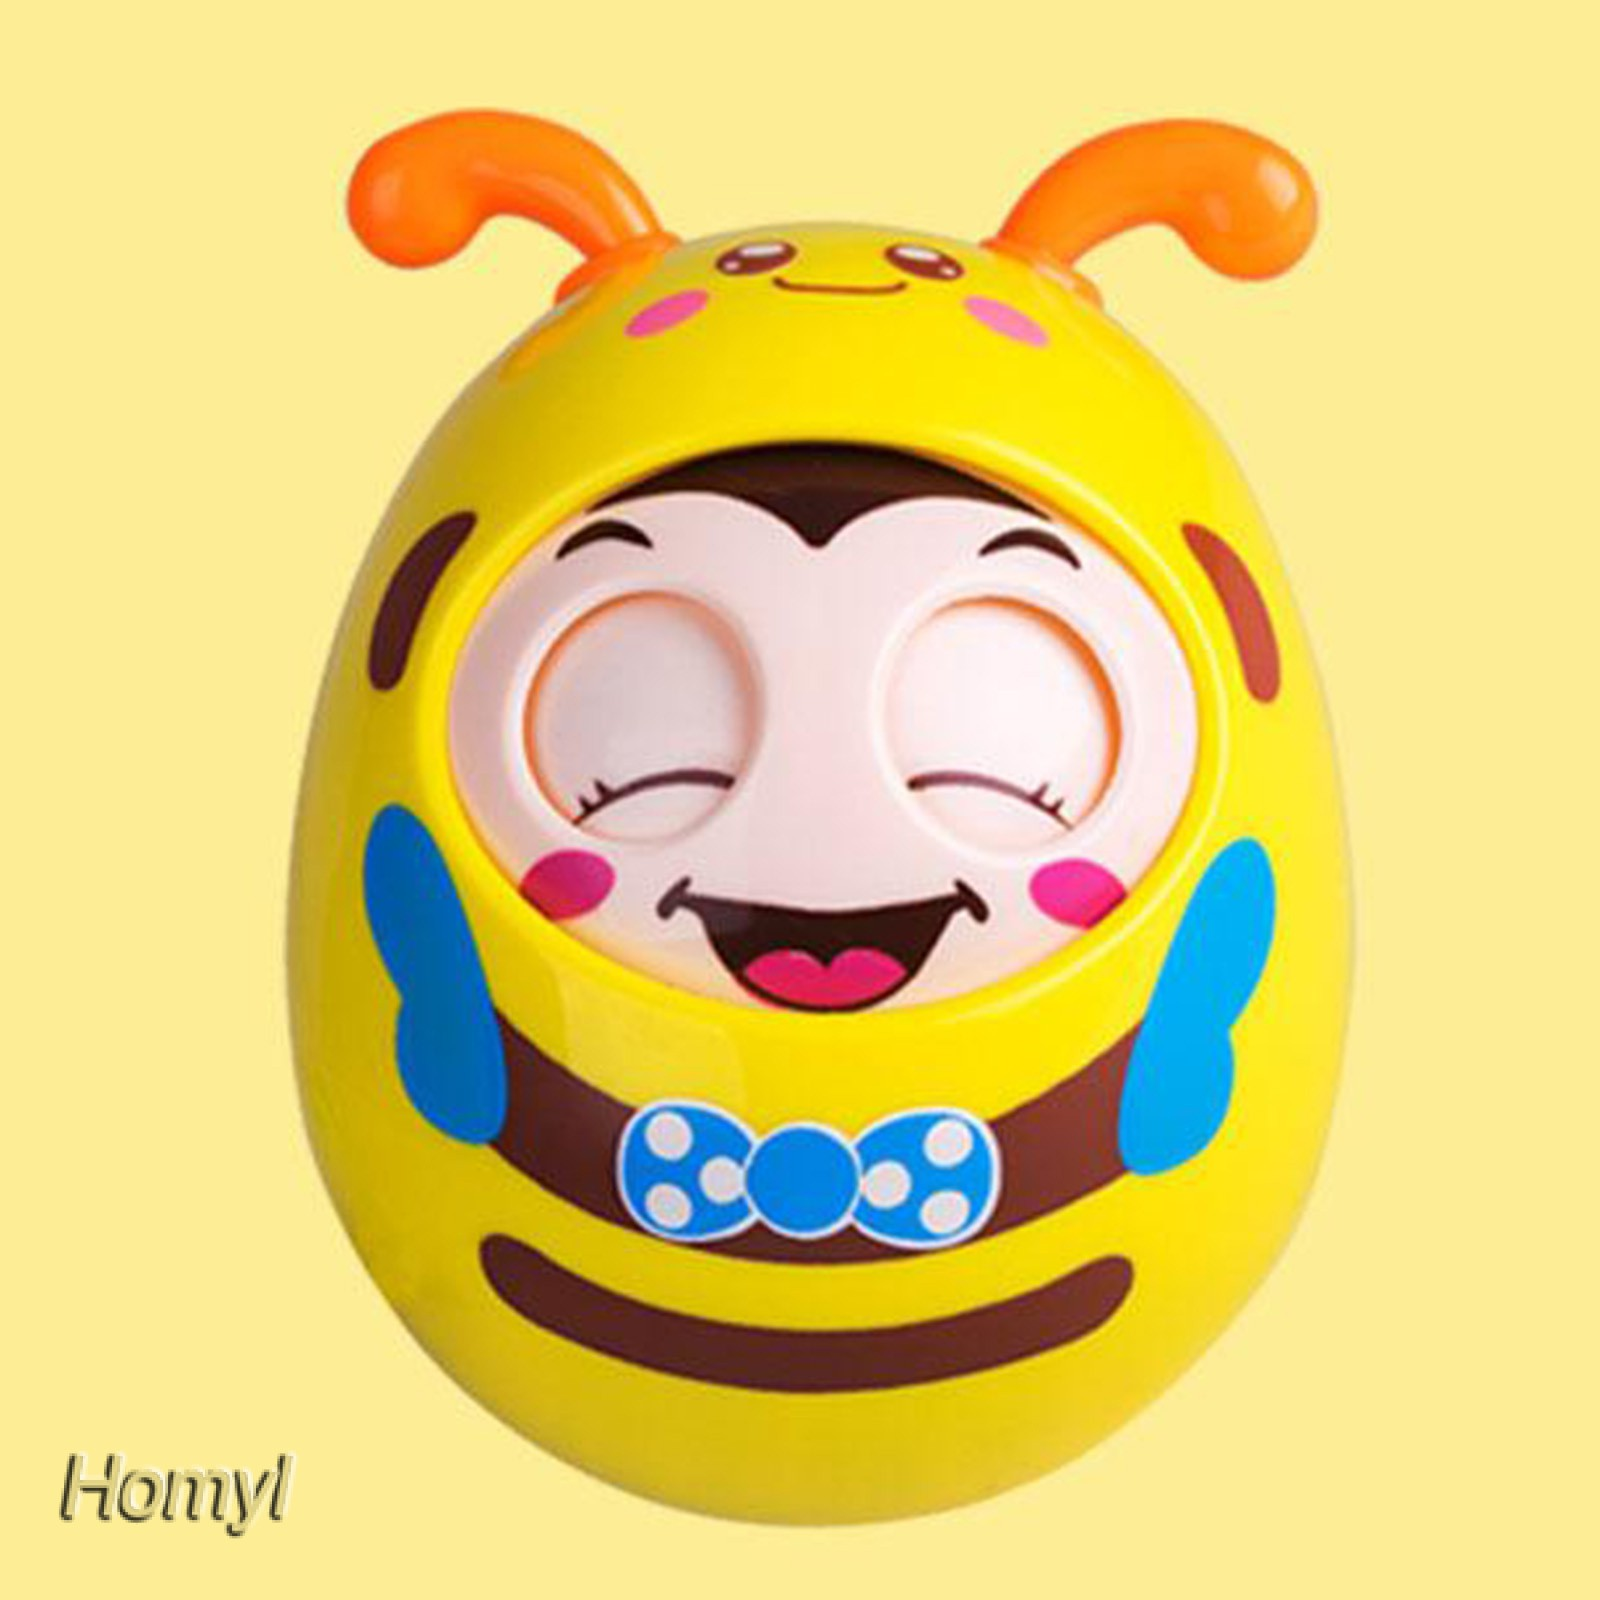 [HOMYL] Safety Roly-Poly Tumbler Doll Infant Baby Toys Developmental Gifts Toy